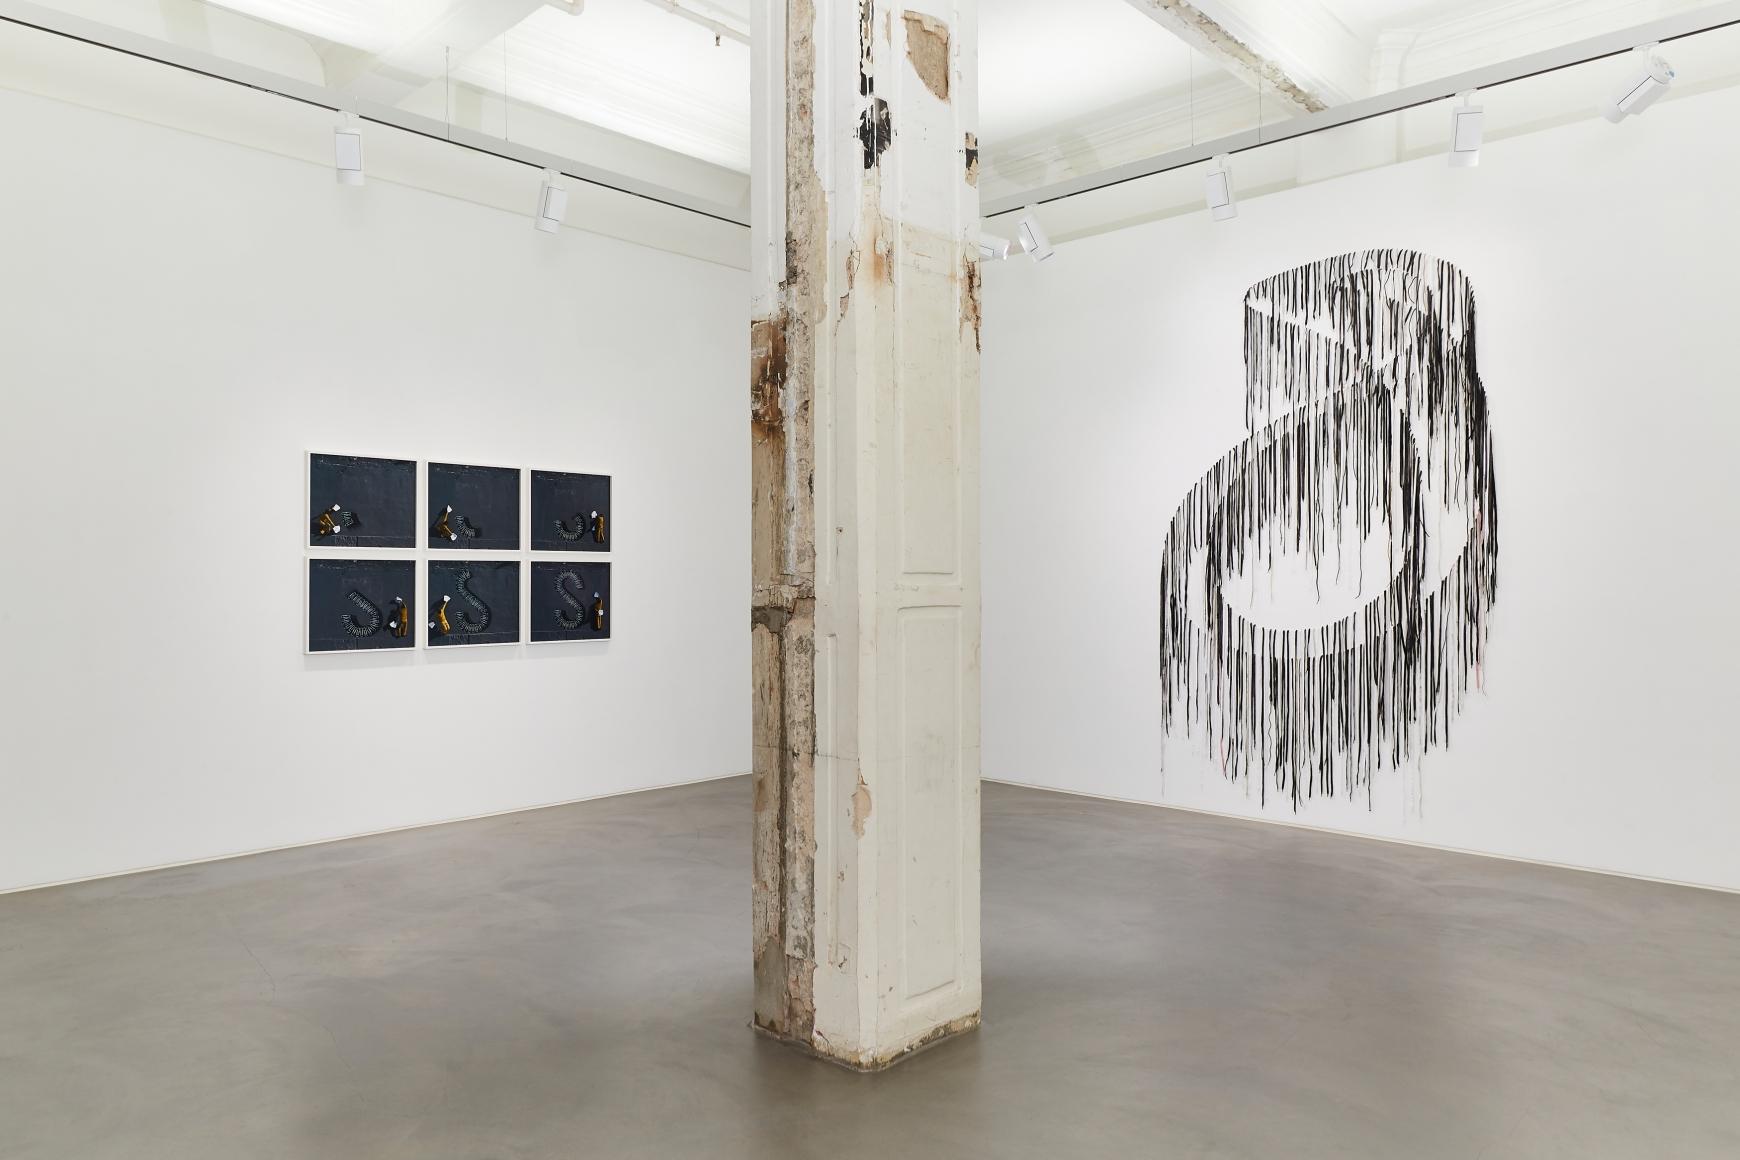 Exhibition view 4 of Robin Rhode & Nari Ward: Power Wall